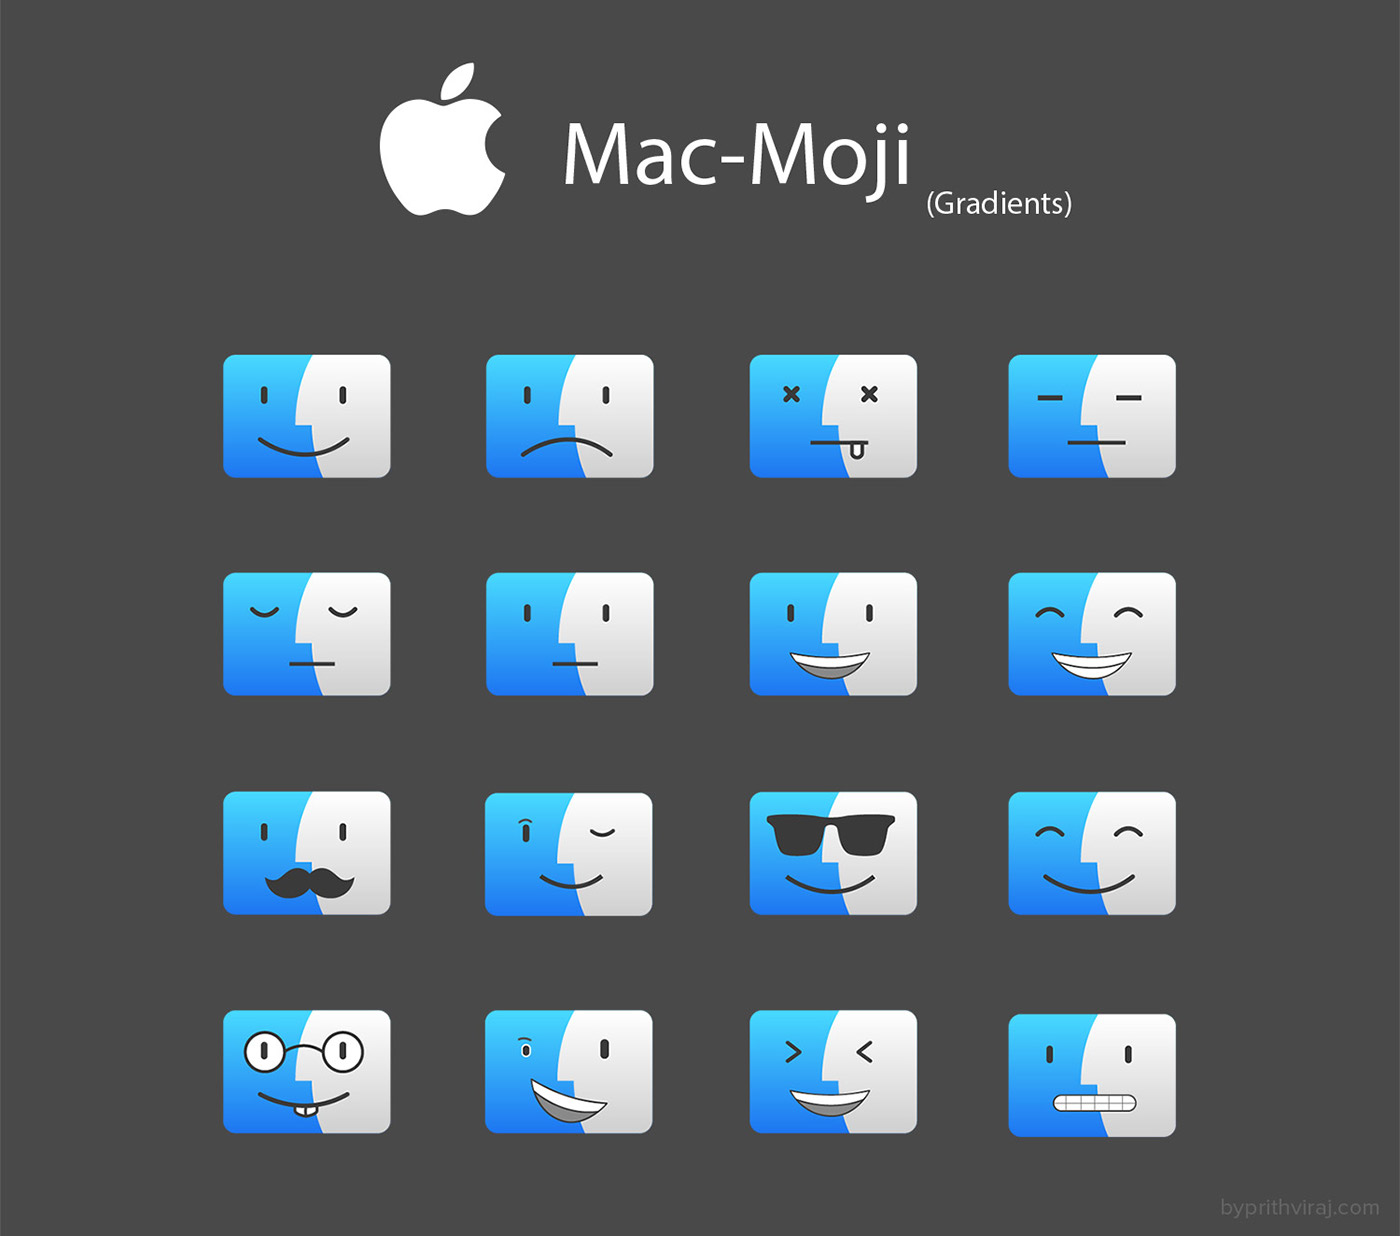 Macintosh mac emoji finder icon finder Emoji mac gradients stroke icons